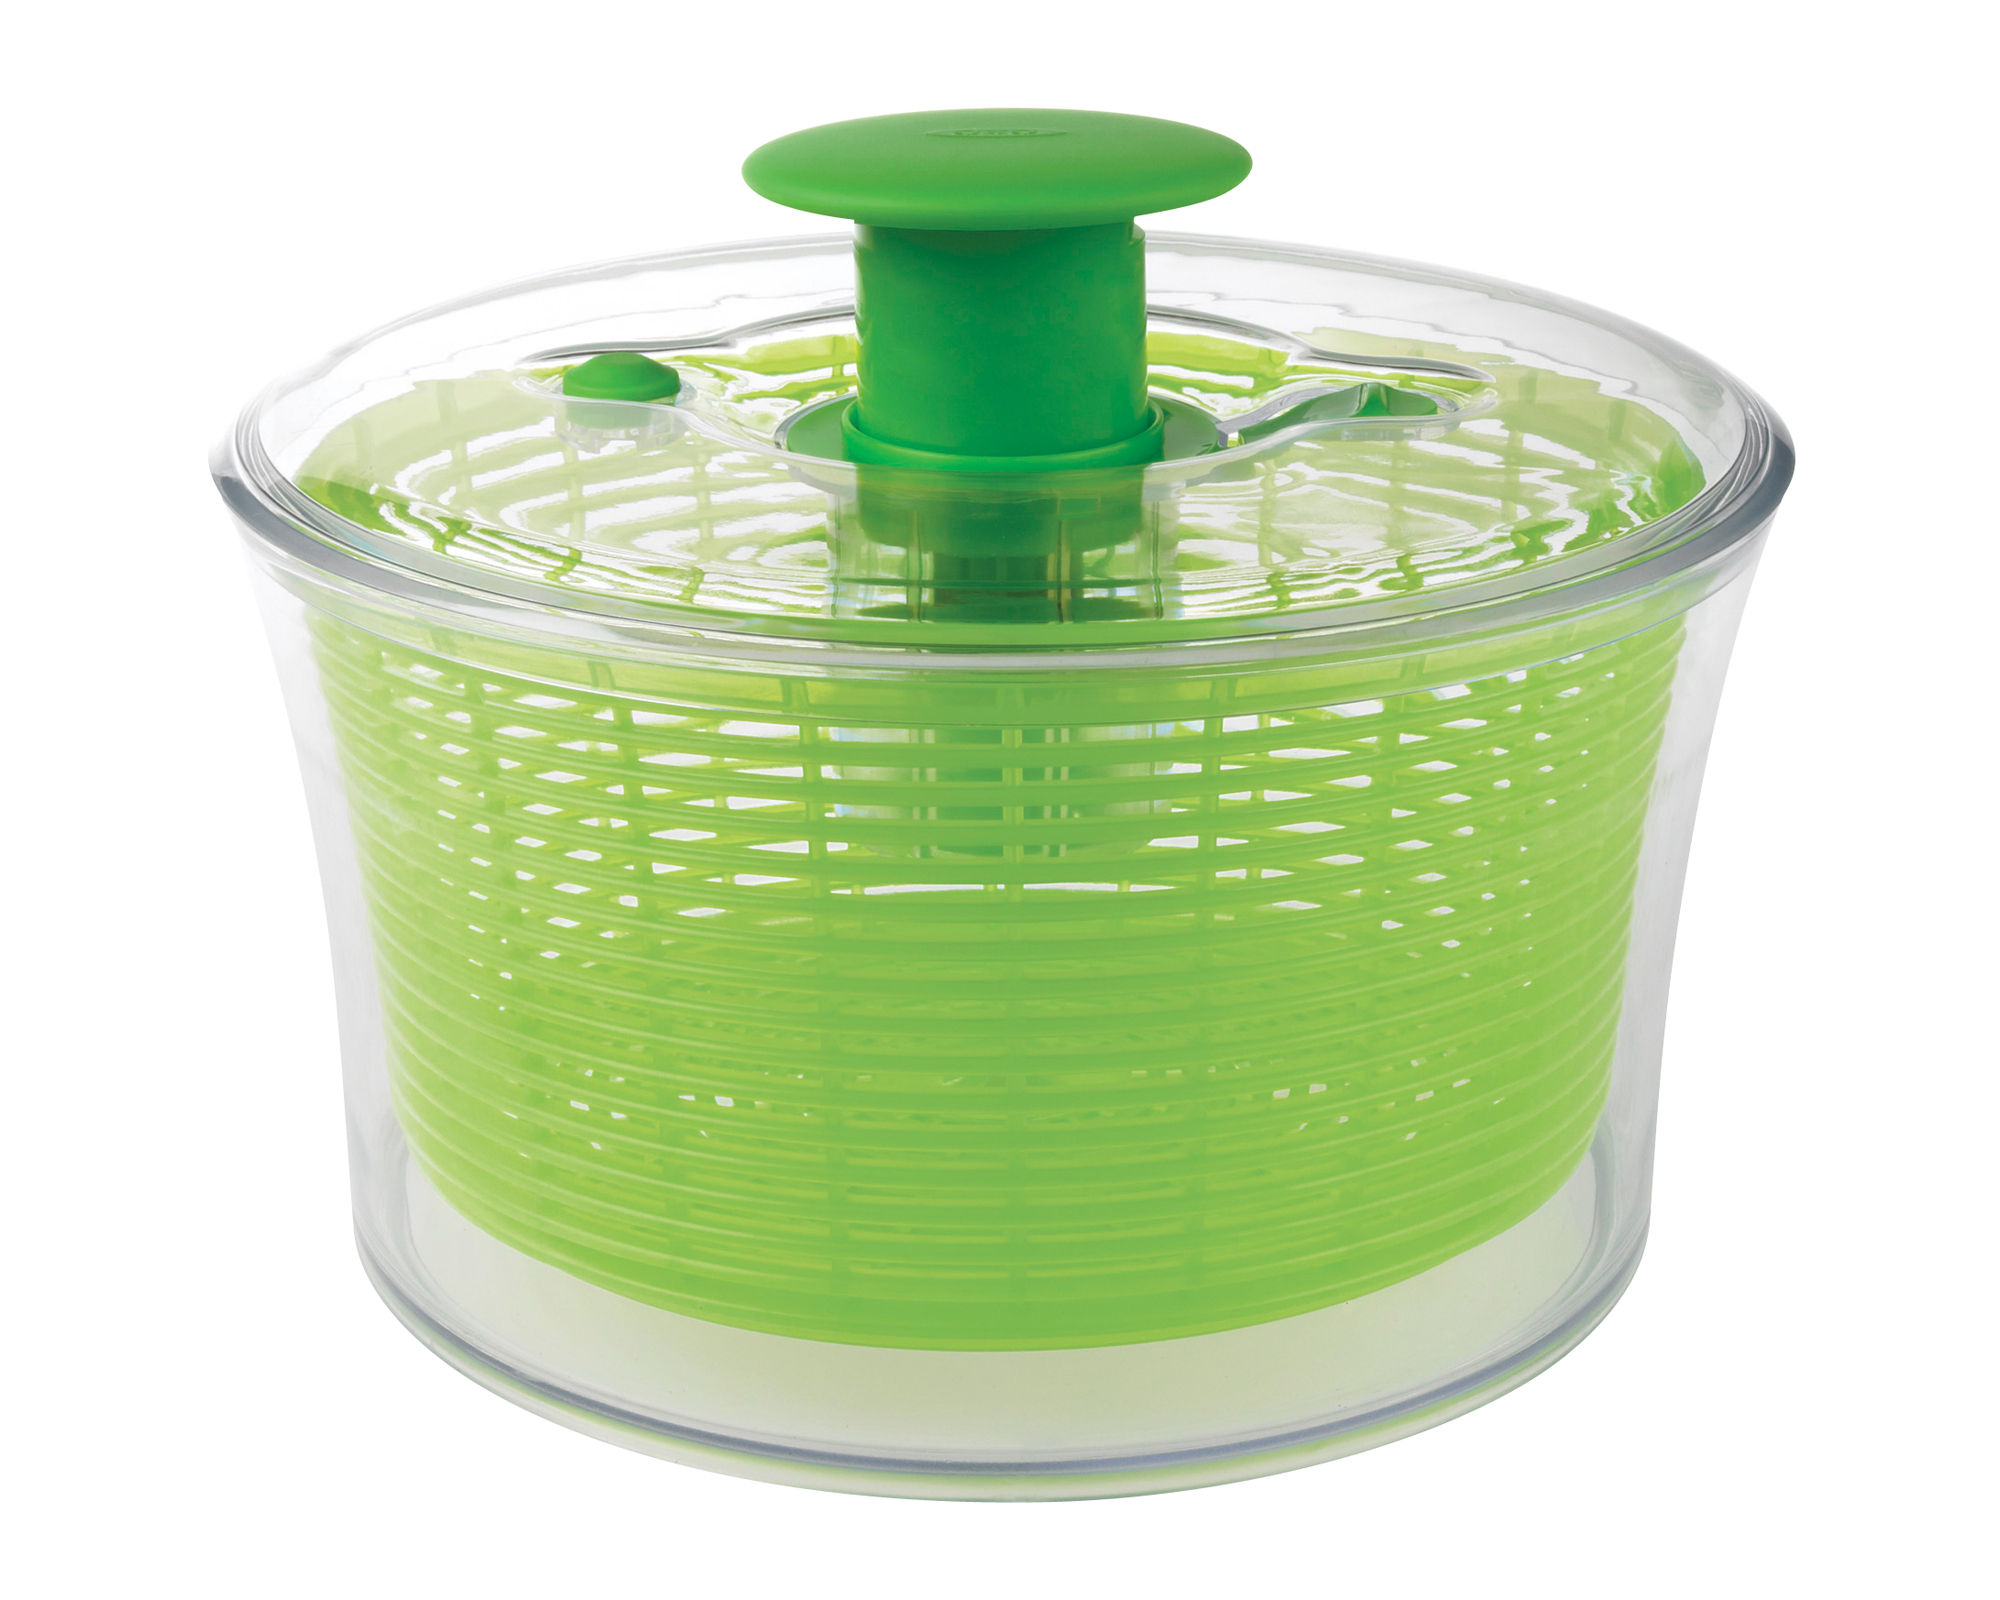 OXO Good Grips Salad Spinner Salad Greens Seeds, Salad Greens Seed, Salad Seeds, Salad Greens, Garden Seeds, Vegetable Seeds